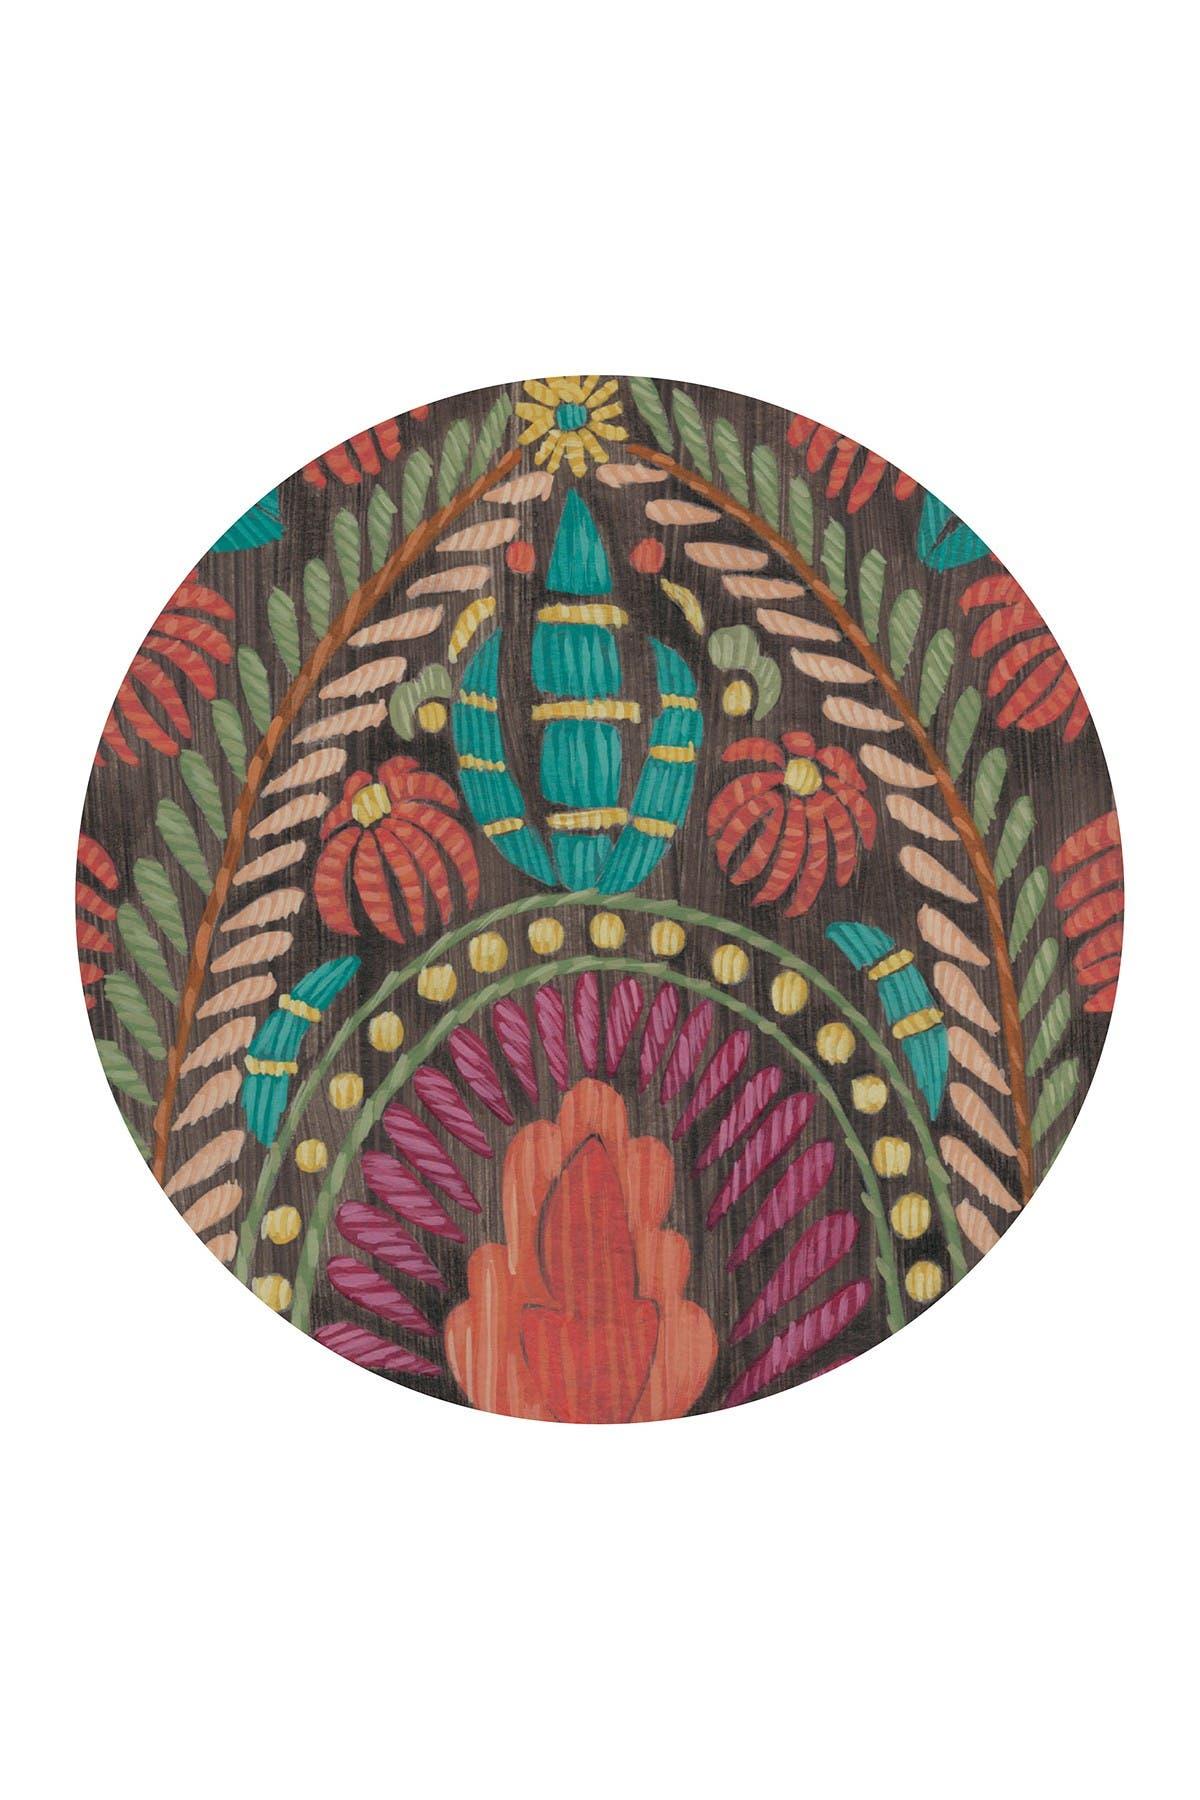 "Image of COURTSIDE MARKET Bohemia I 30"" x 30"" Gallery Art Decal"